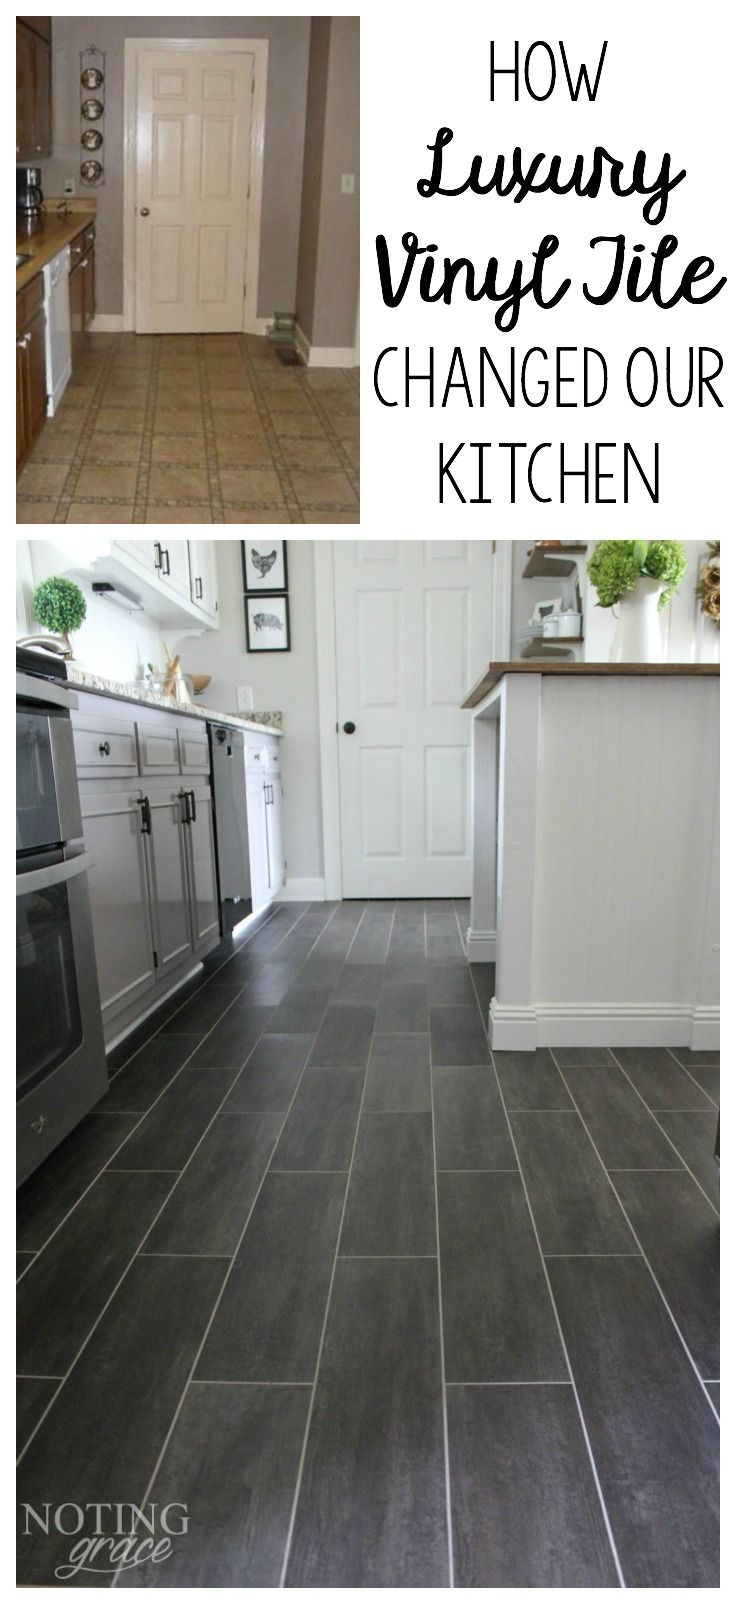 DIY Kitchen Flooring Diy kitchen flooring, Inexpensive